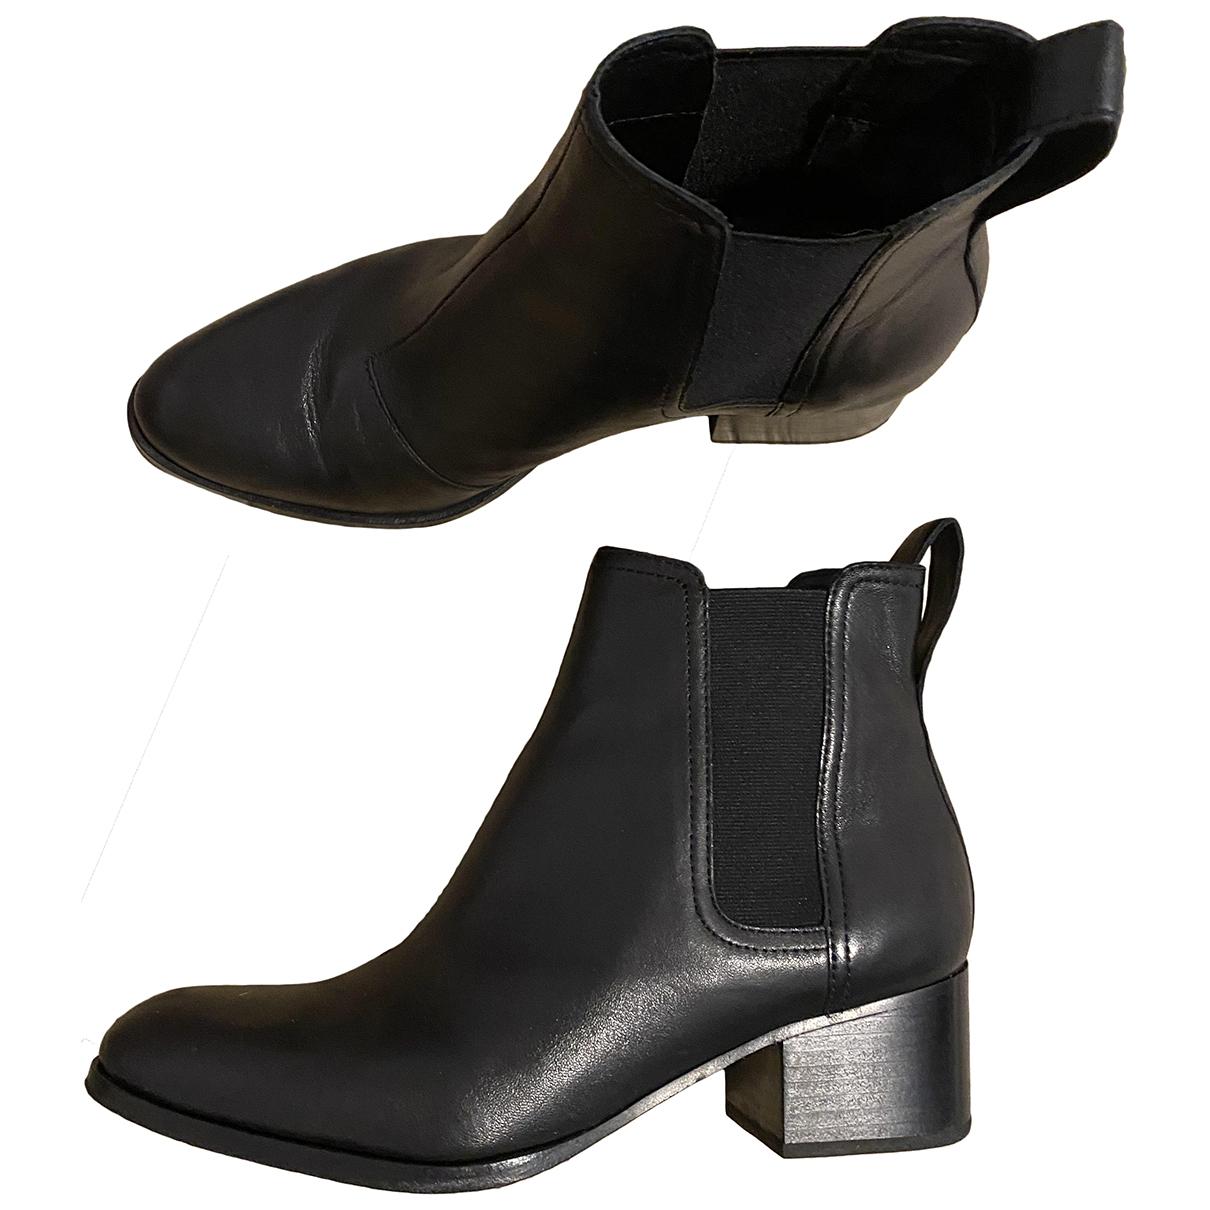 Rag & Bone N Black Leather Boots for Women 7.5 US